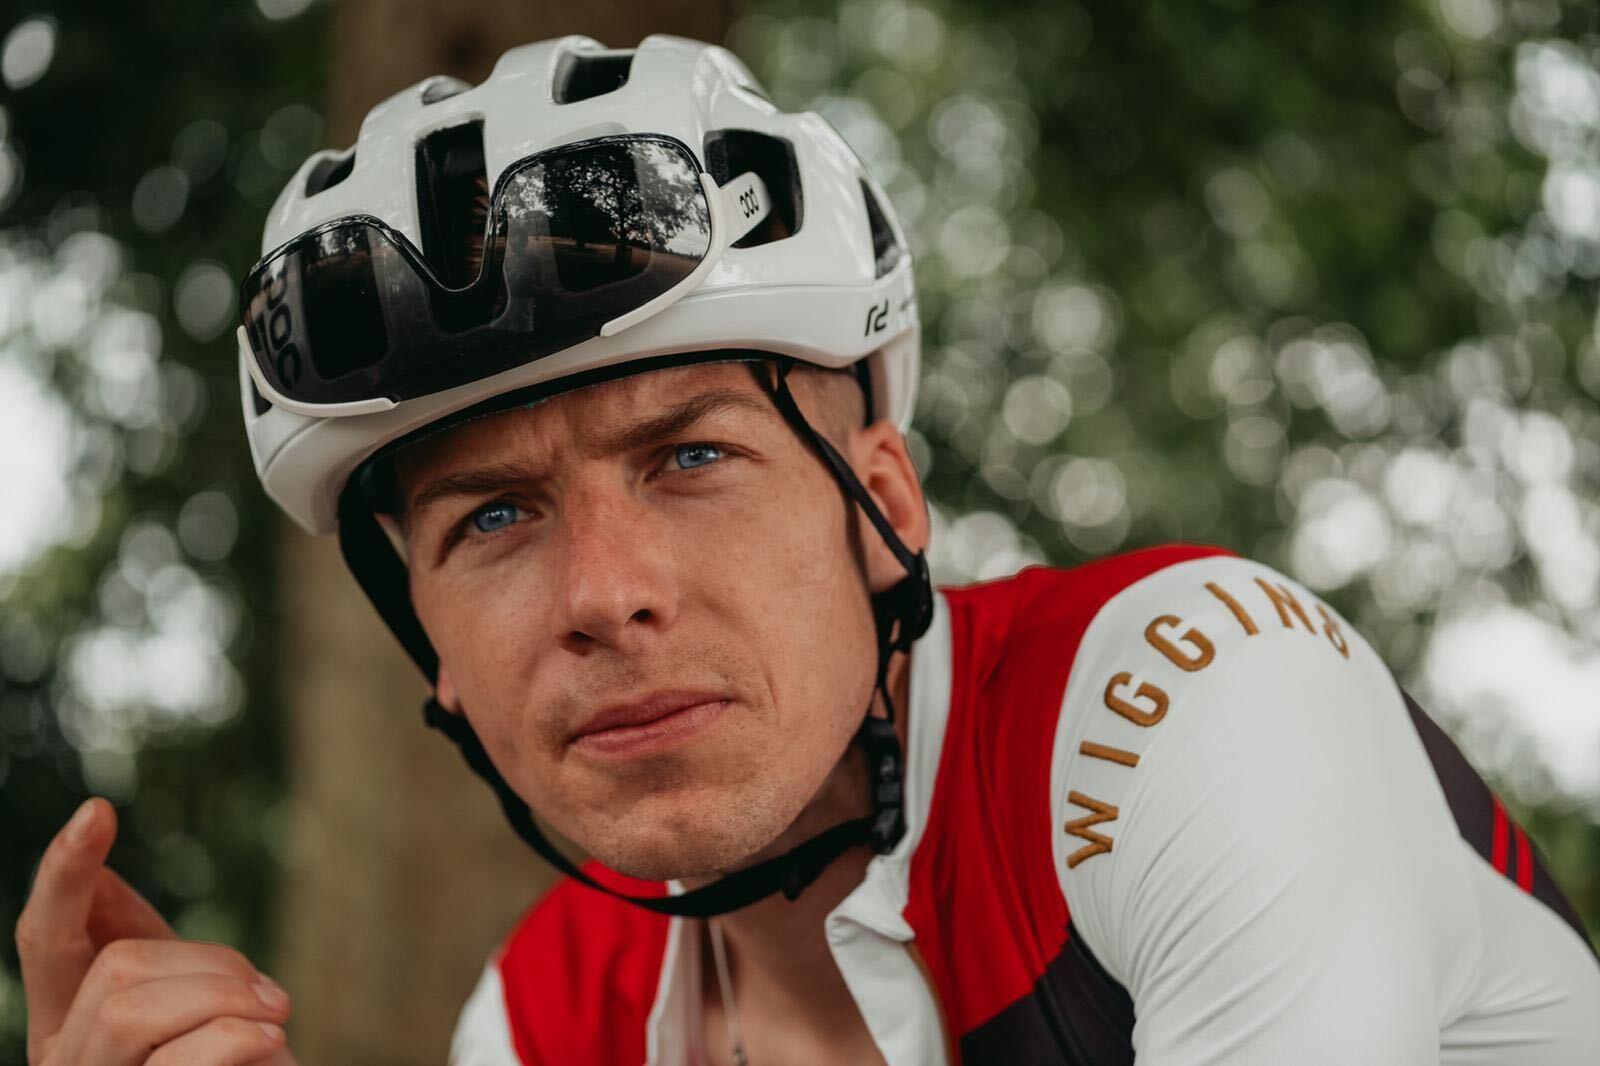 Gareth Winter